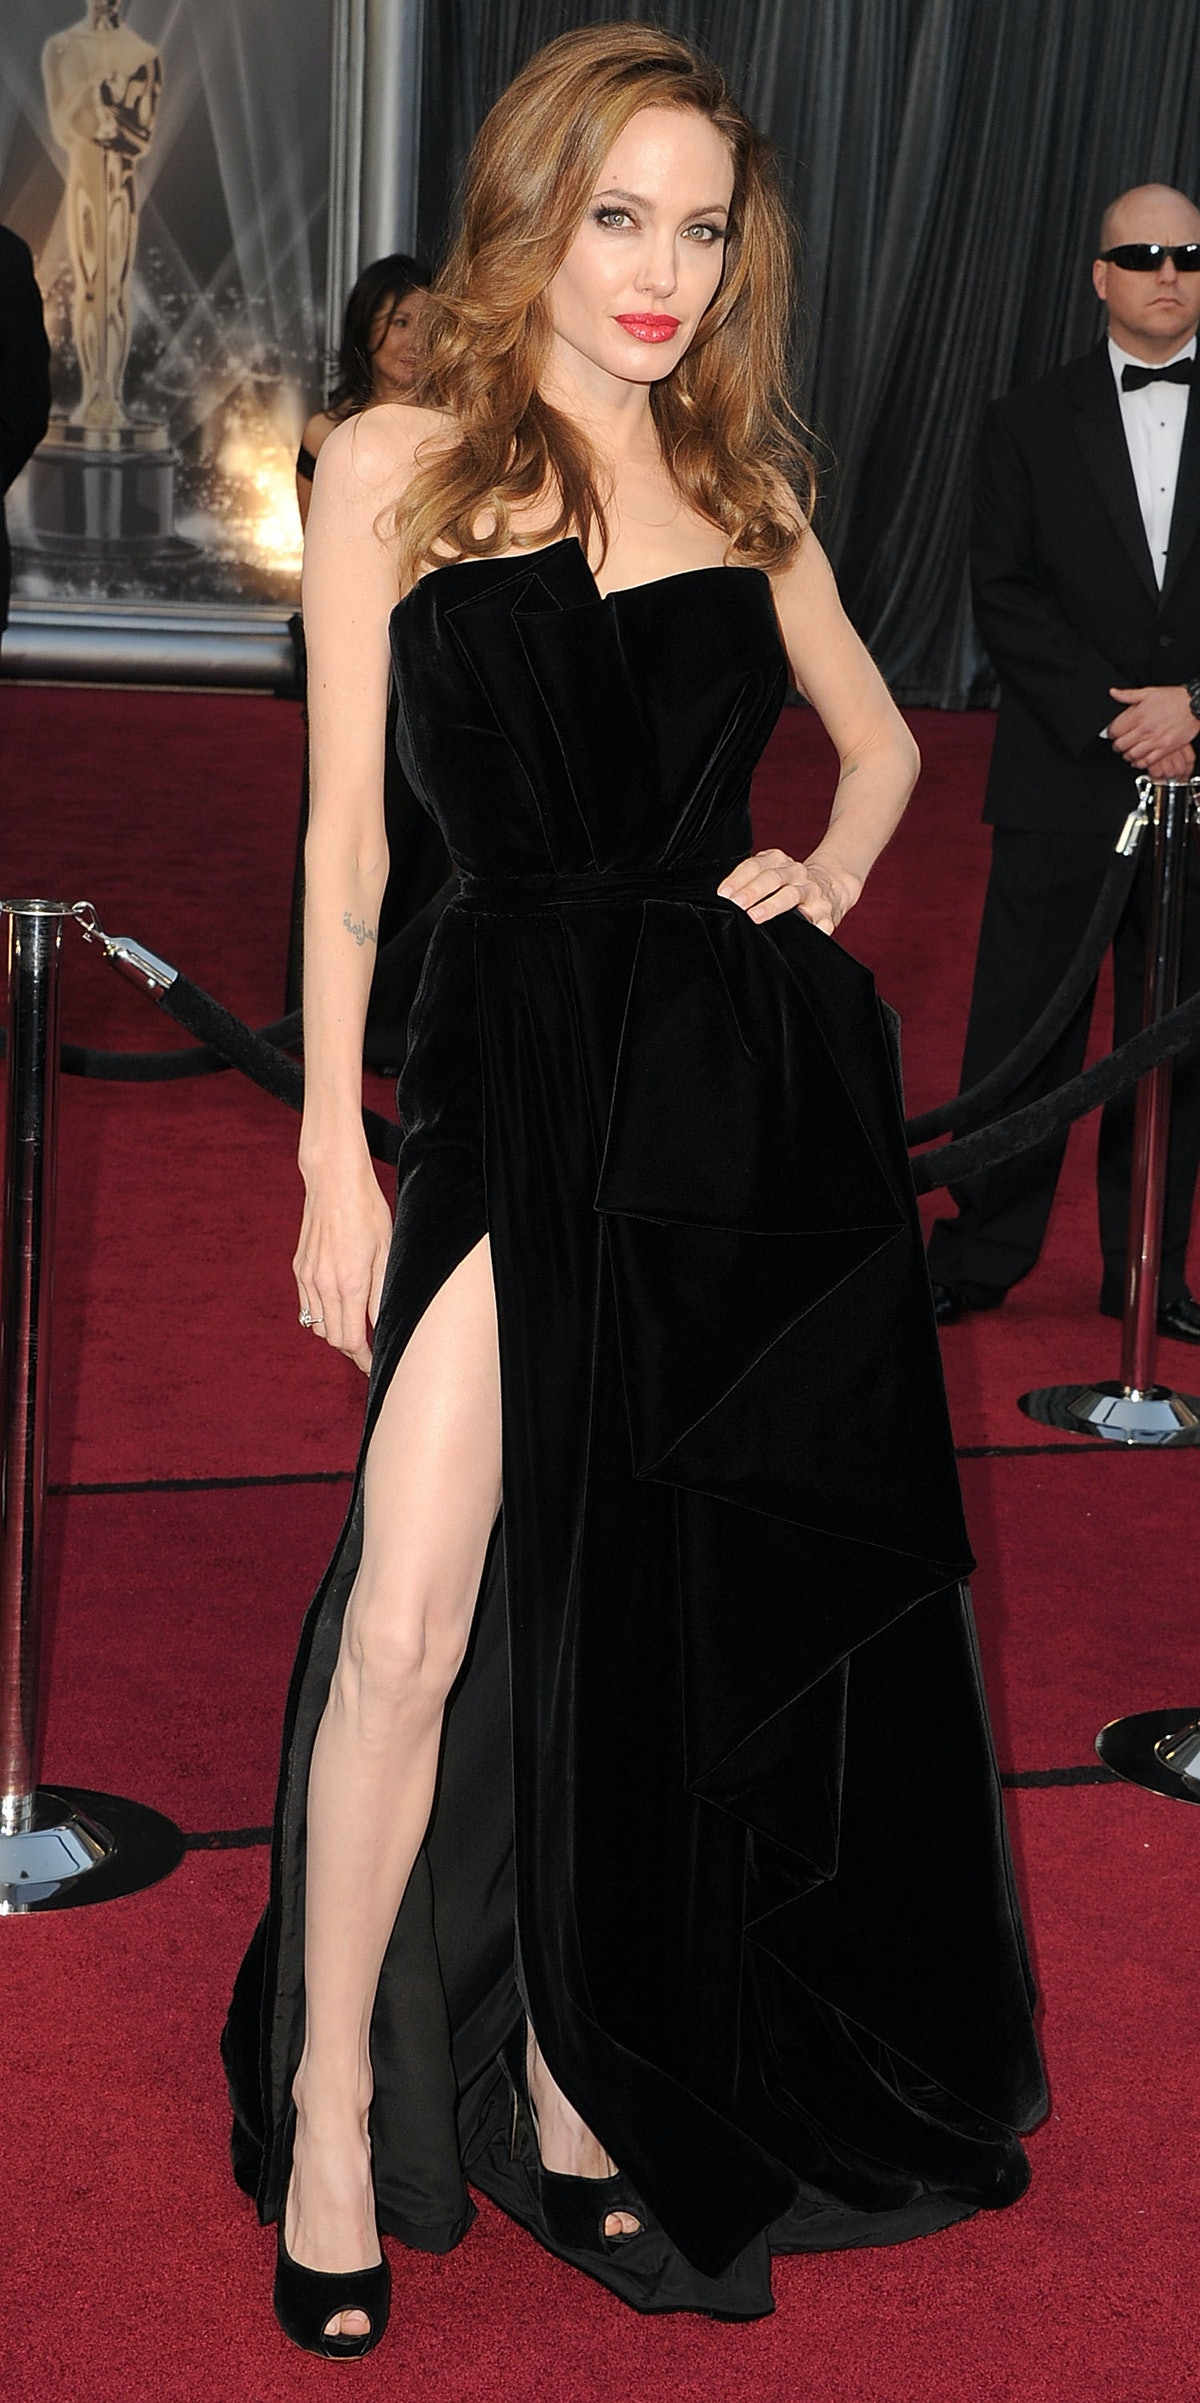 Angelina Jolie posing in a black dress